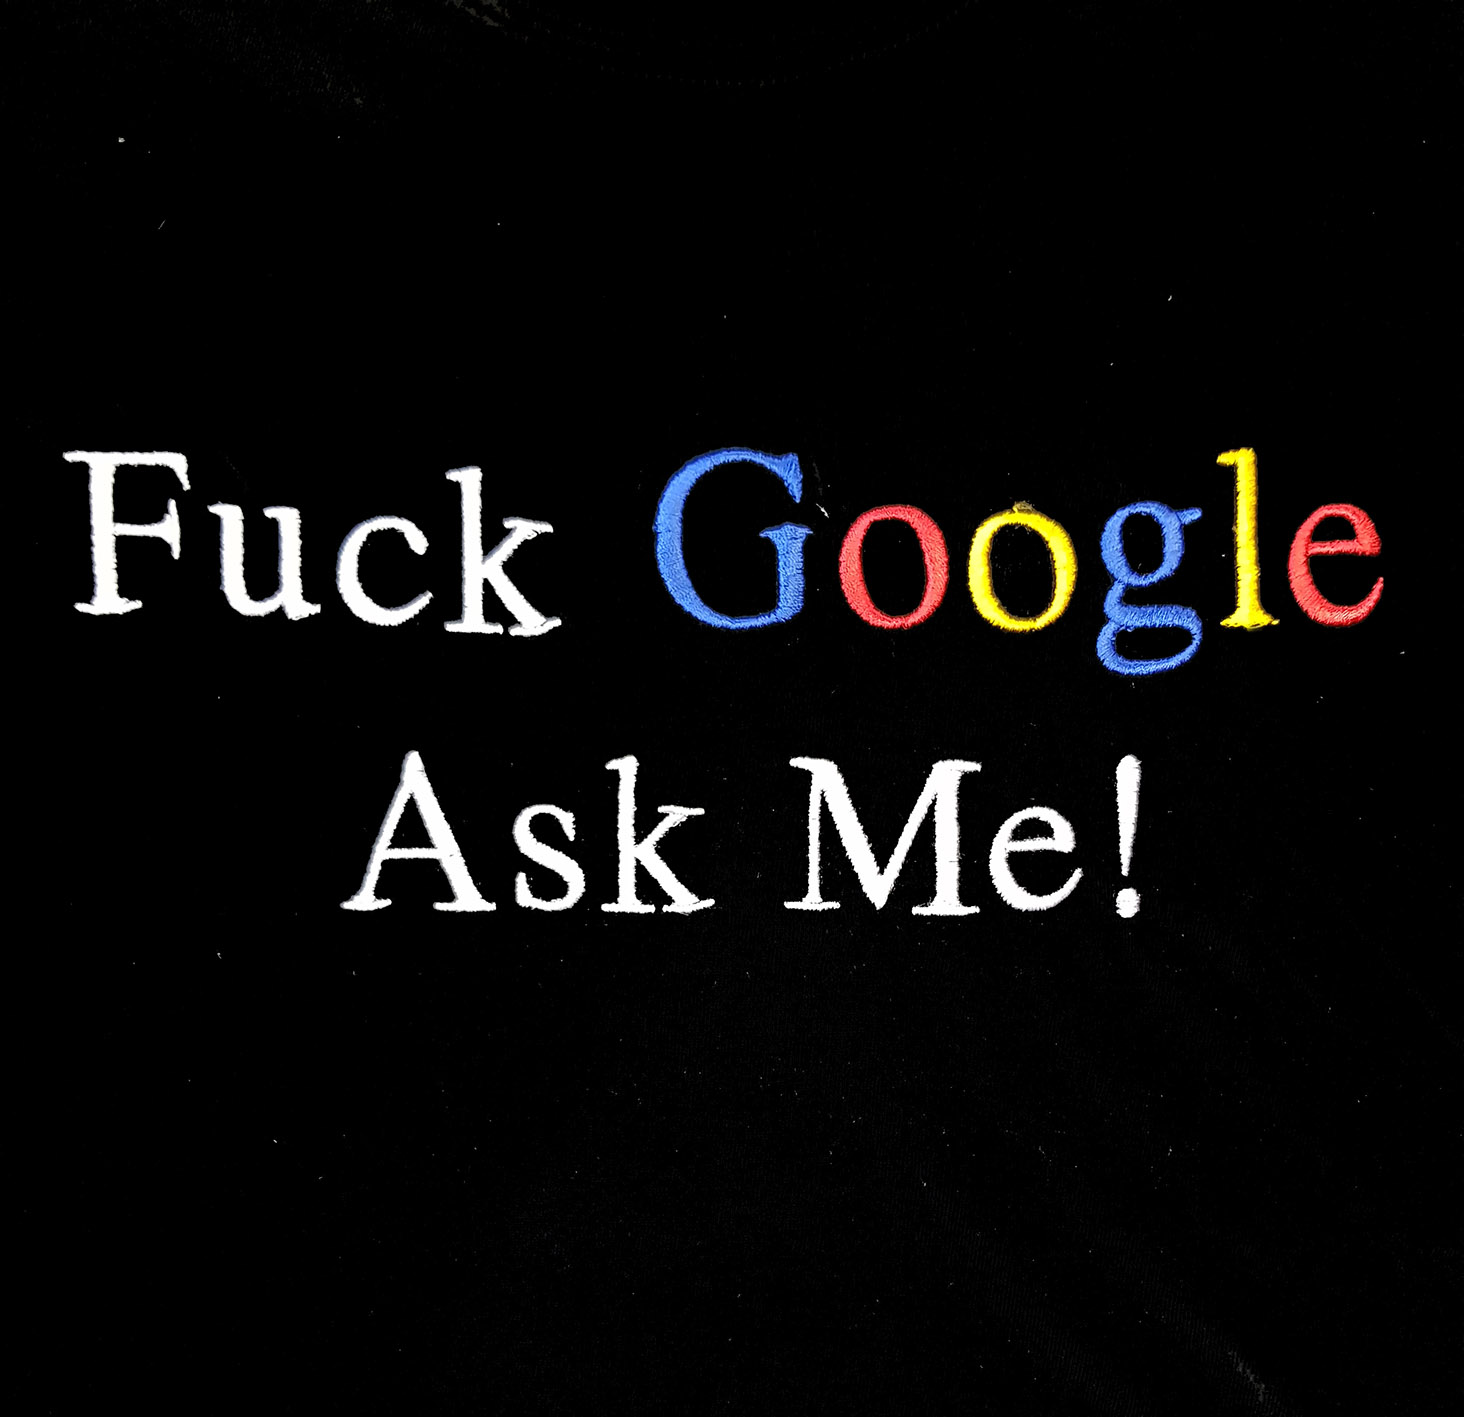 FUCK GOOGLE ASK ME! T-SHIRT - Kalimera Store